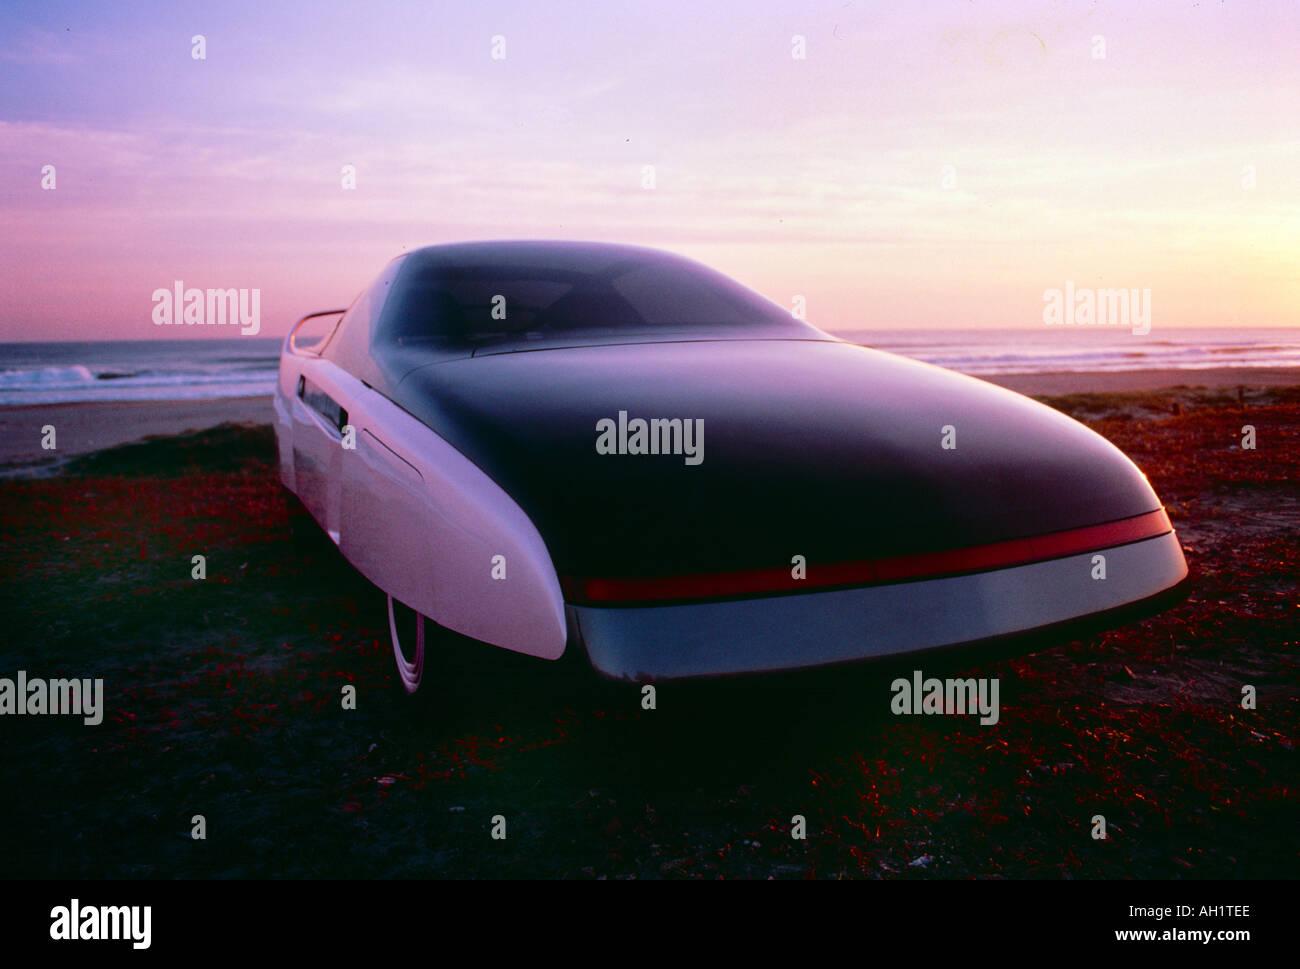 Futuristic Concept Car - Stock Image